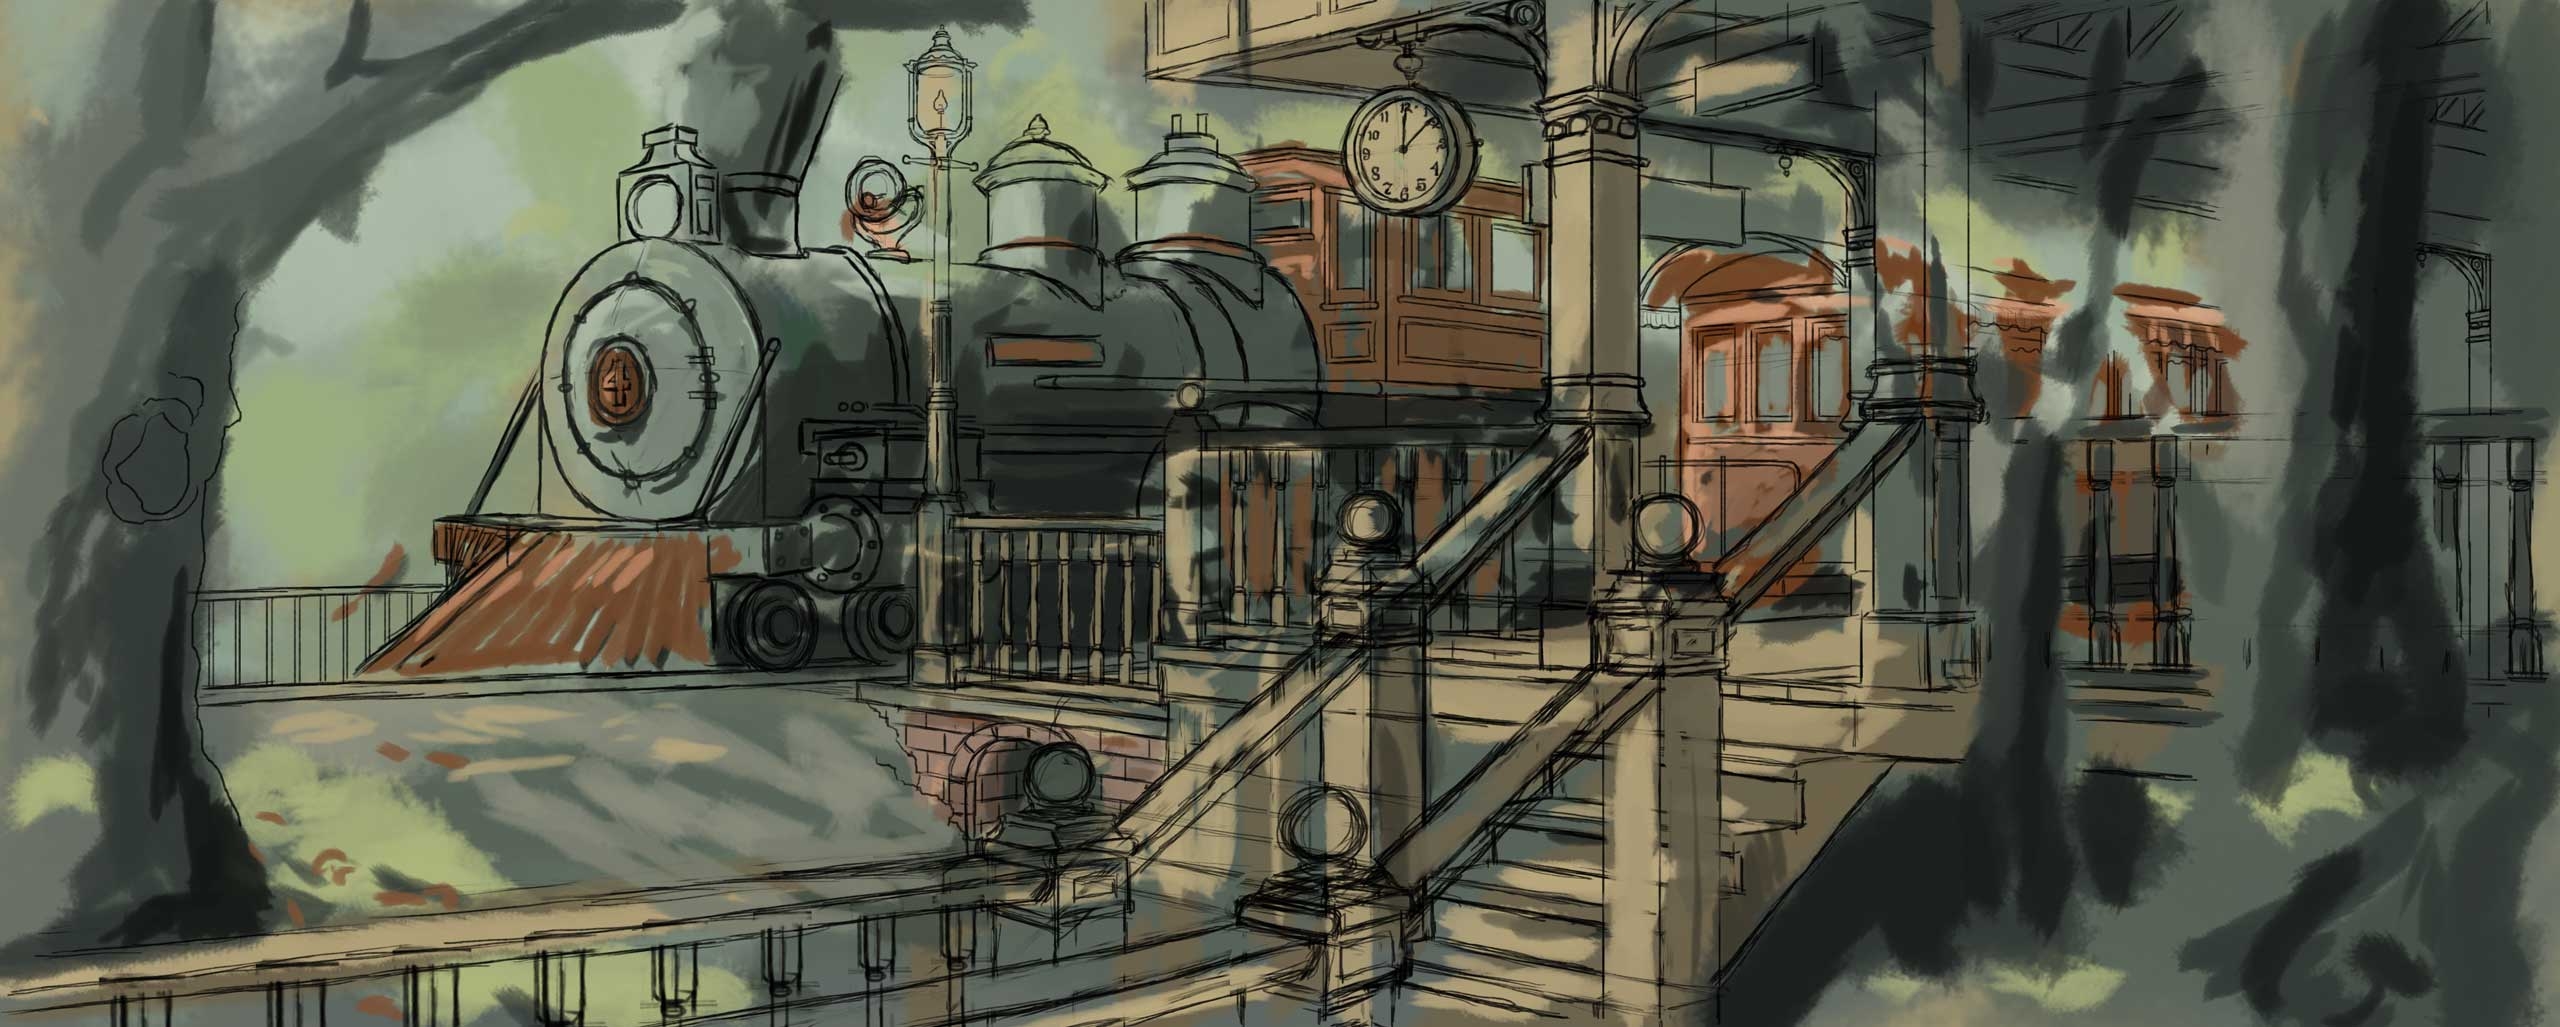 train depot digital drawing